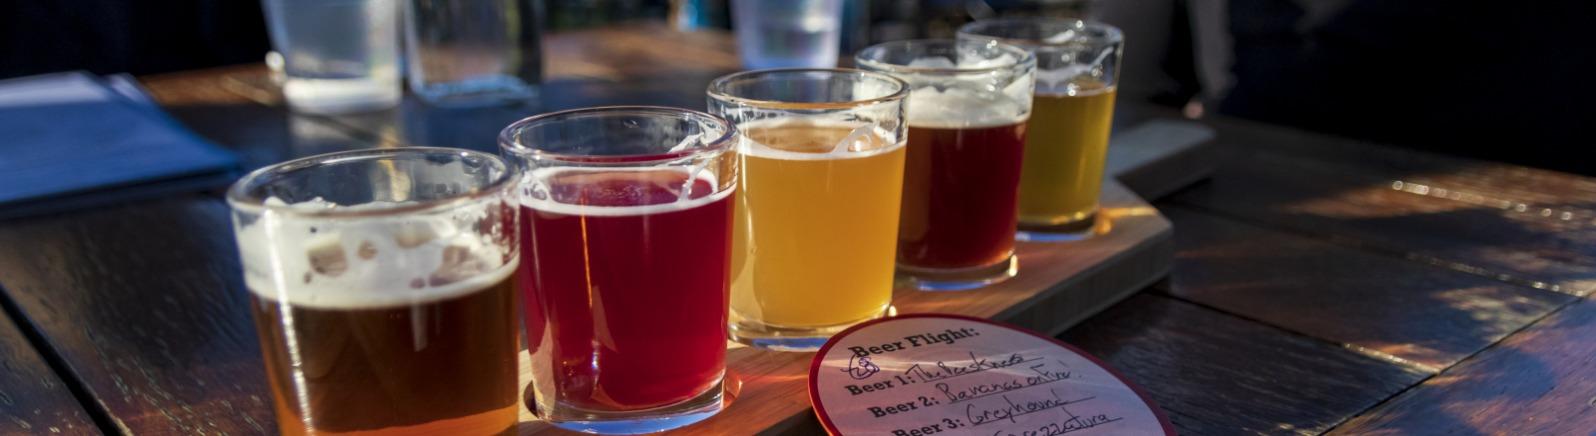 beer flight at Stickmen Brewing in Lake Oswego